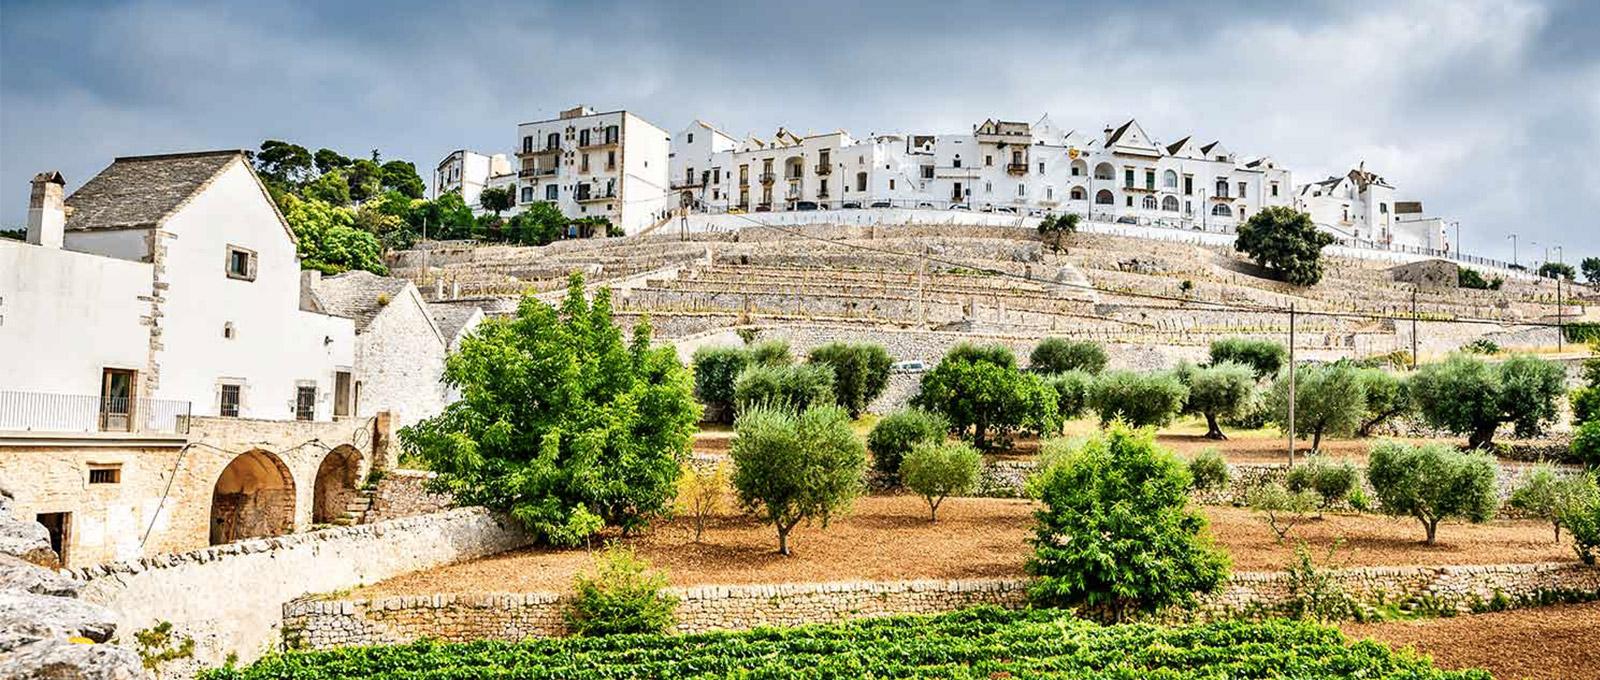 Vacanze in Puglia | Casa Vacanza Martina Franca